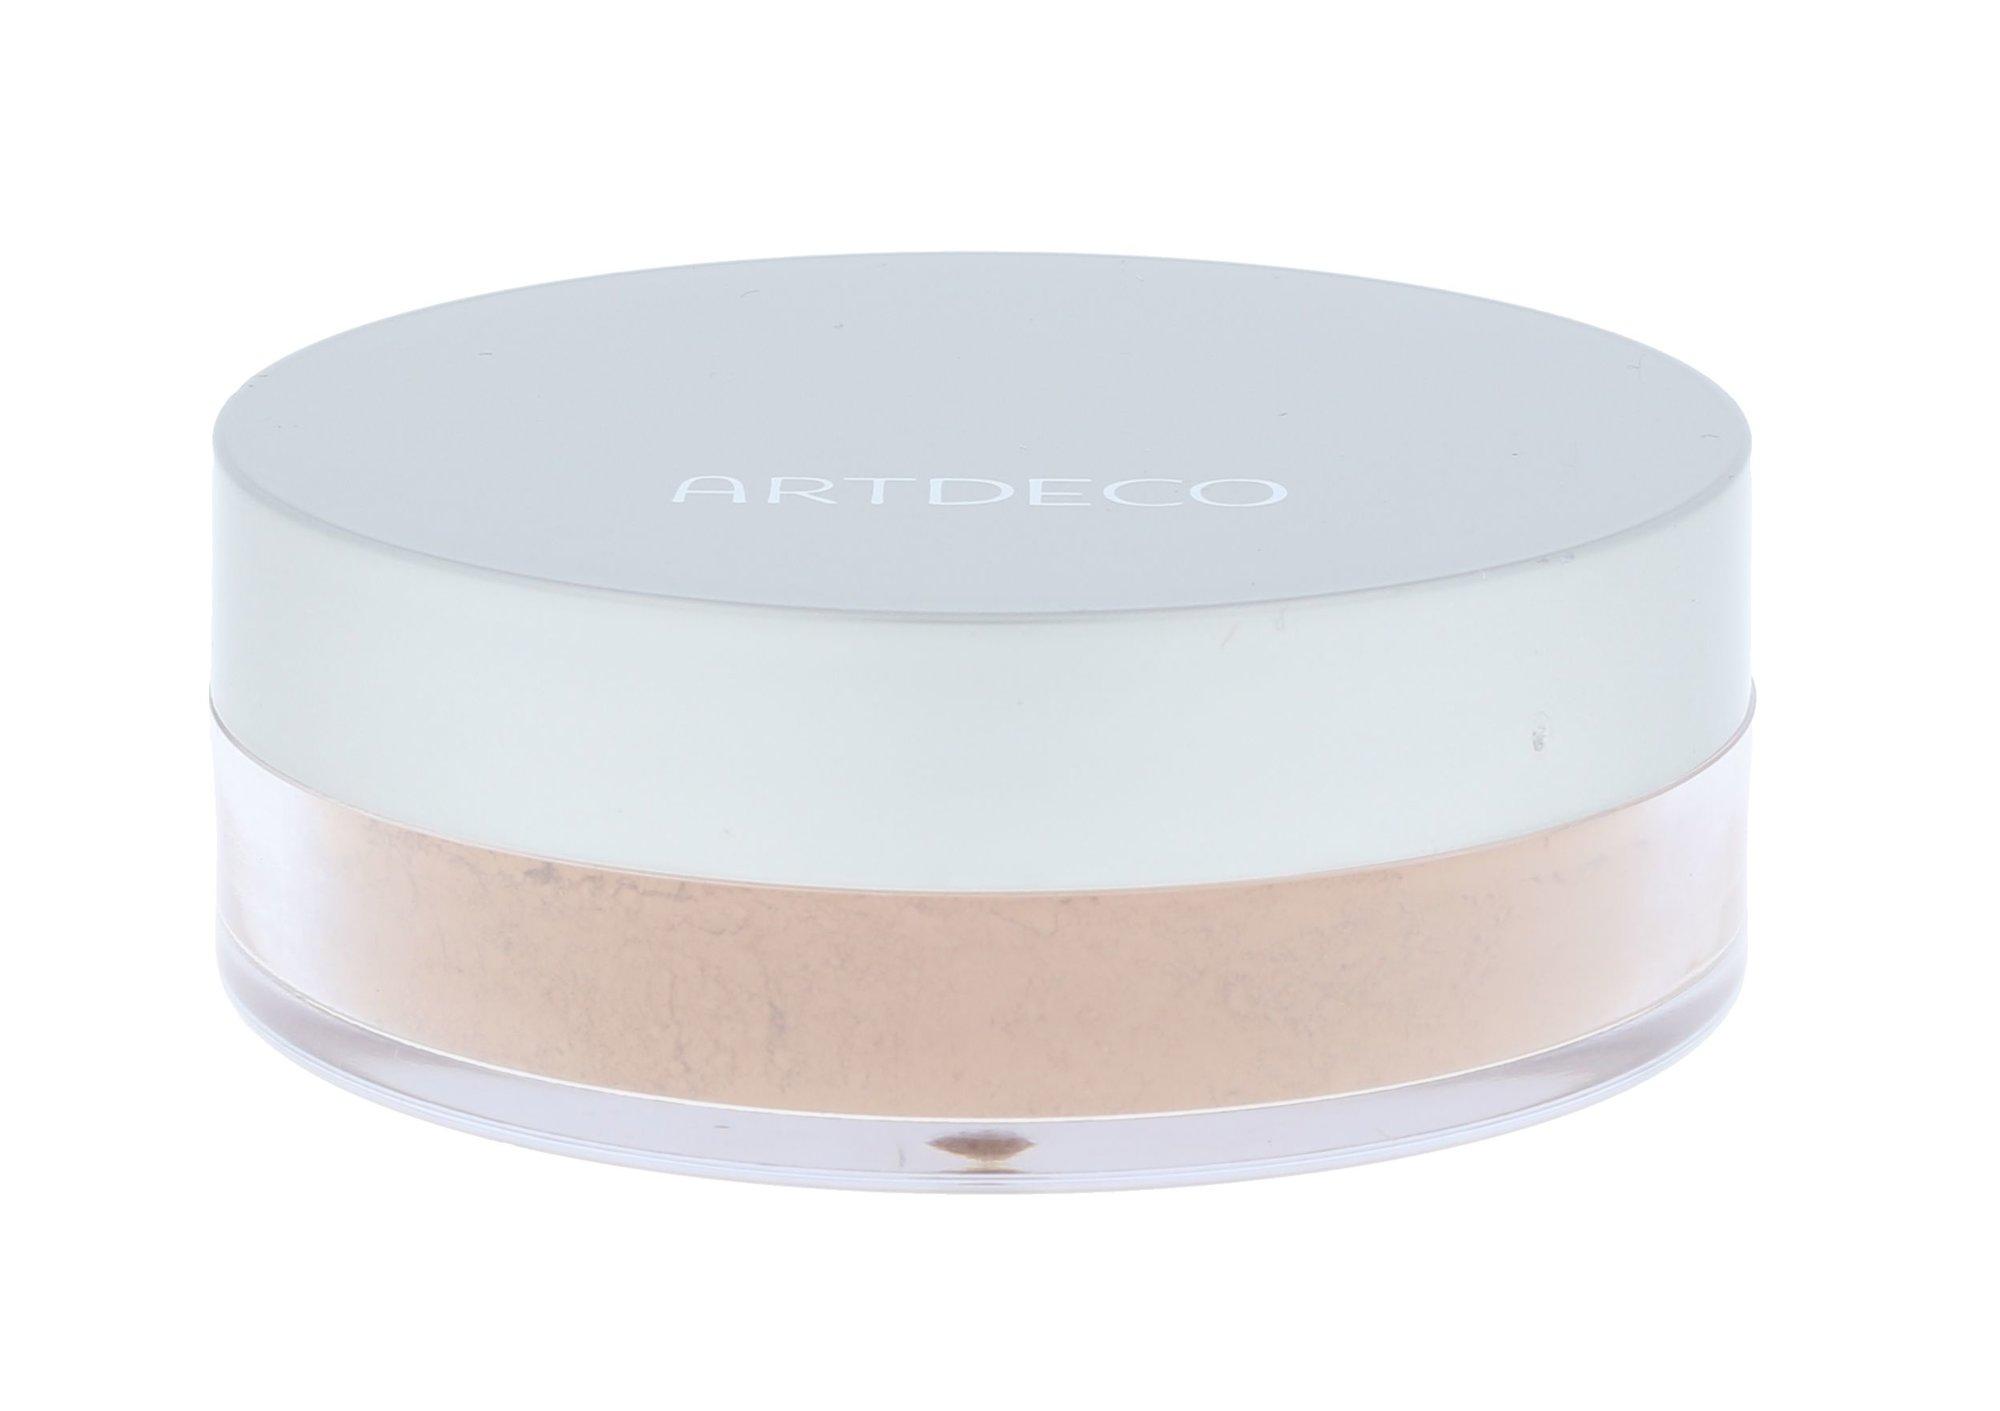 Kompaktinė pudra Artdeco Pure Minerals